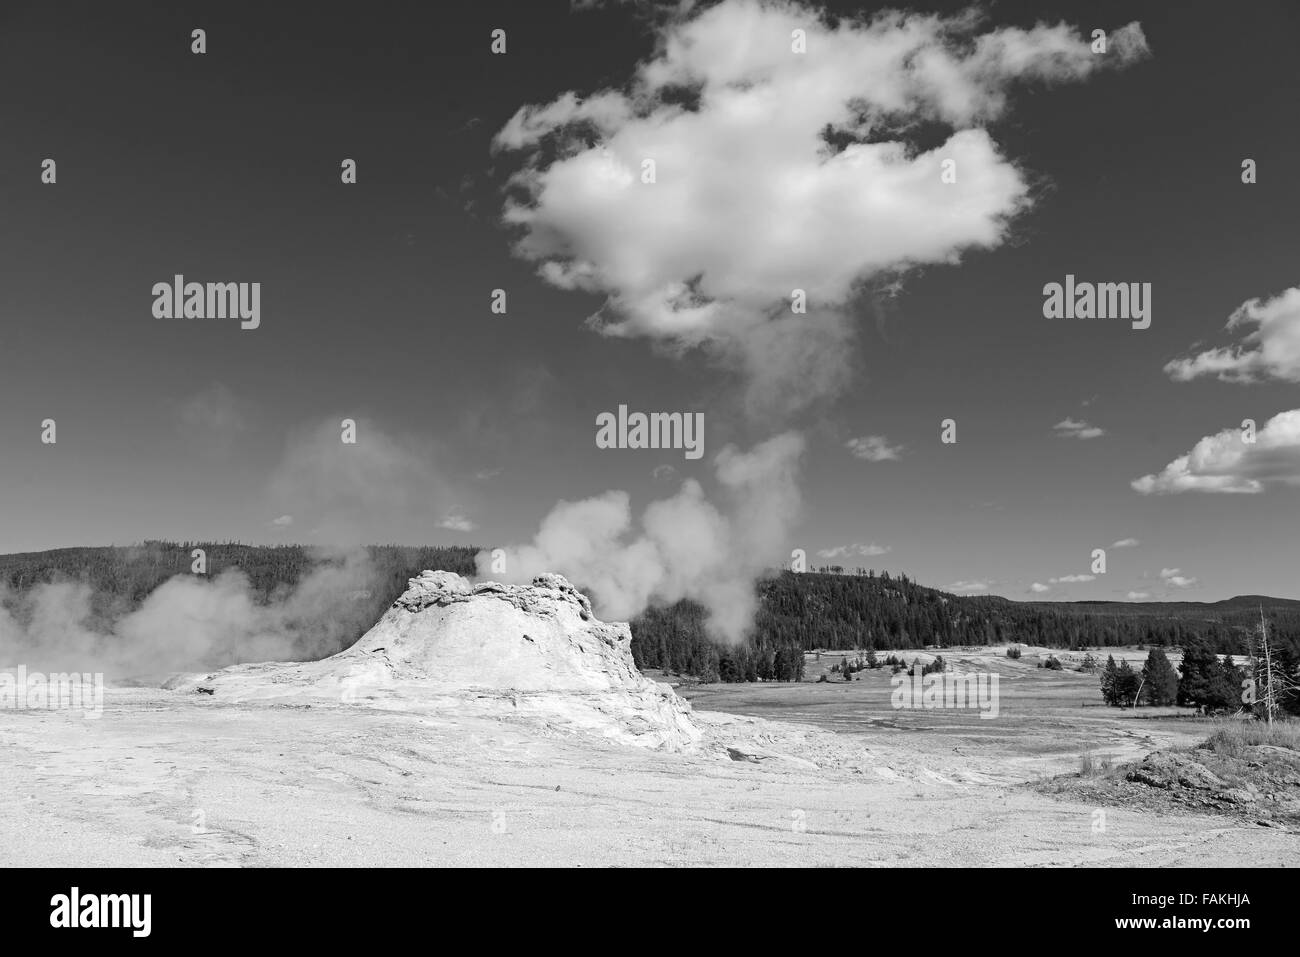 Geothermal activity at Yellowstone National Park, Wyoming, USA - Stock Image